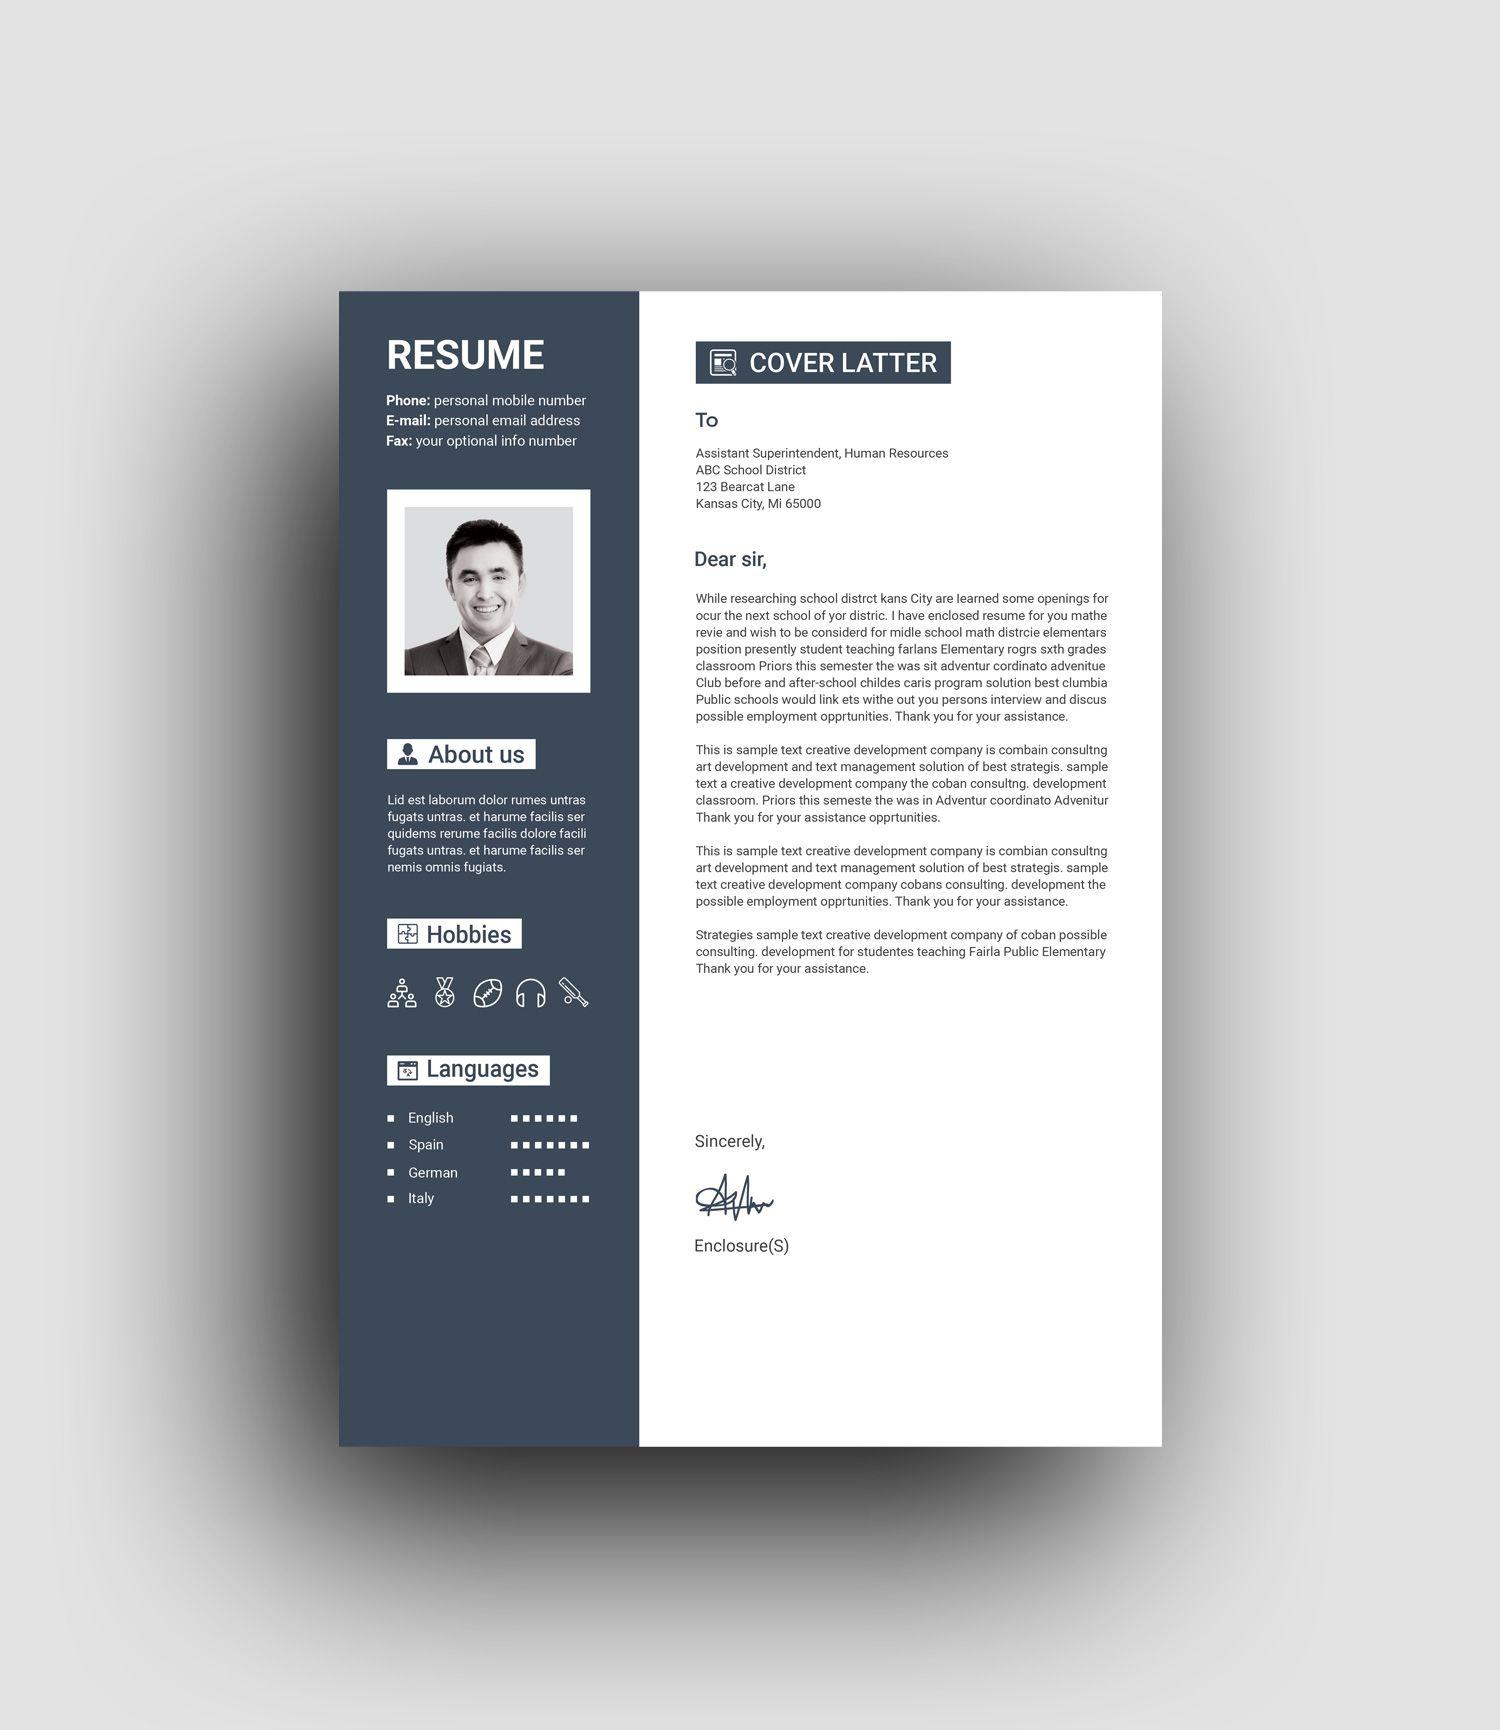 Hera Elegant Professional Resume Template Graphic Templates Unique Resume Template Resume Template Professional Functional Resume Template